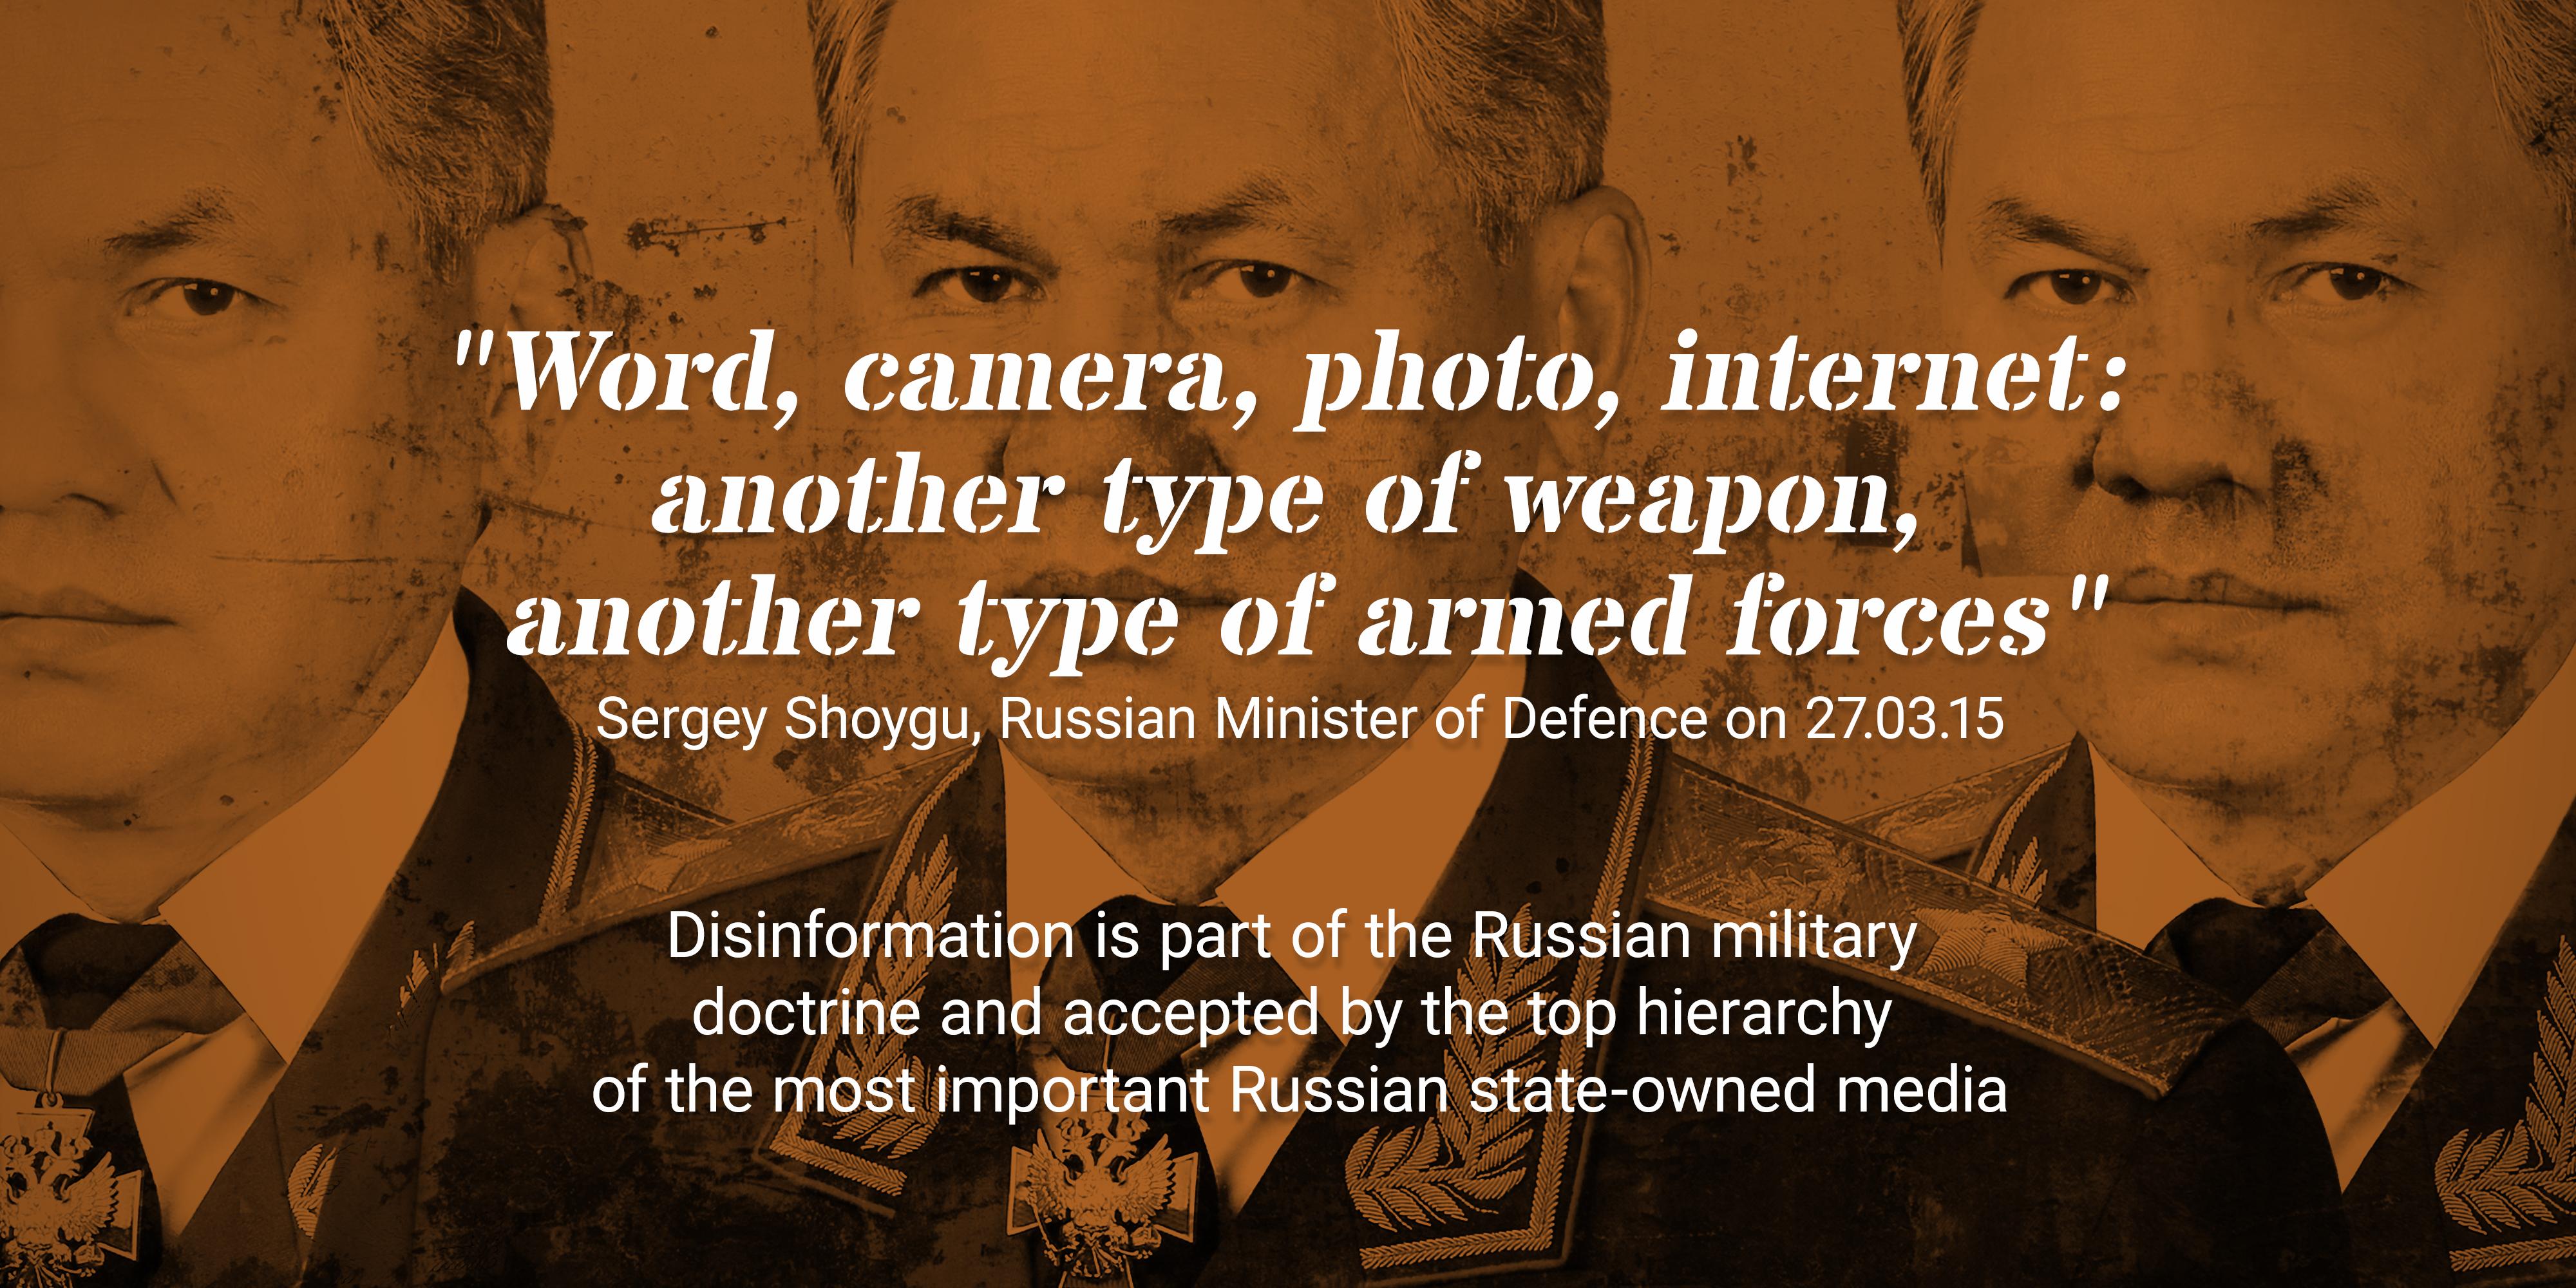 La propagande - Page 39 Commentary_2018_EUvsDesinfo_image4_FINAL